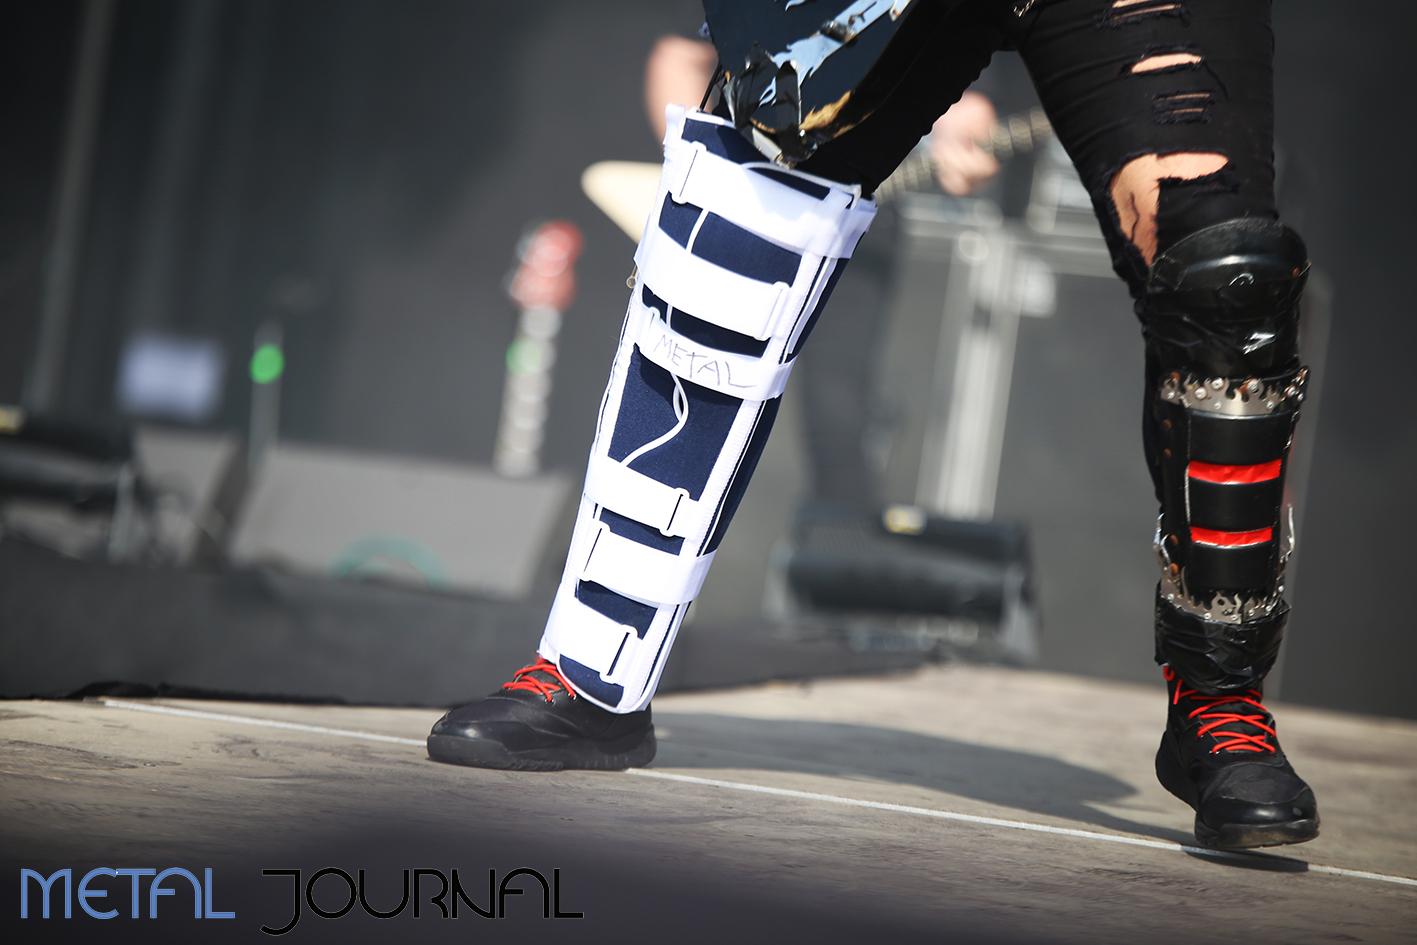 raven - metal journal rock fest barcelona 2019 pic 2